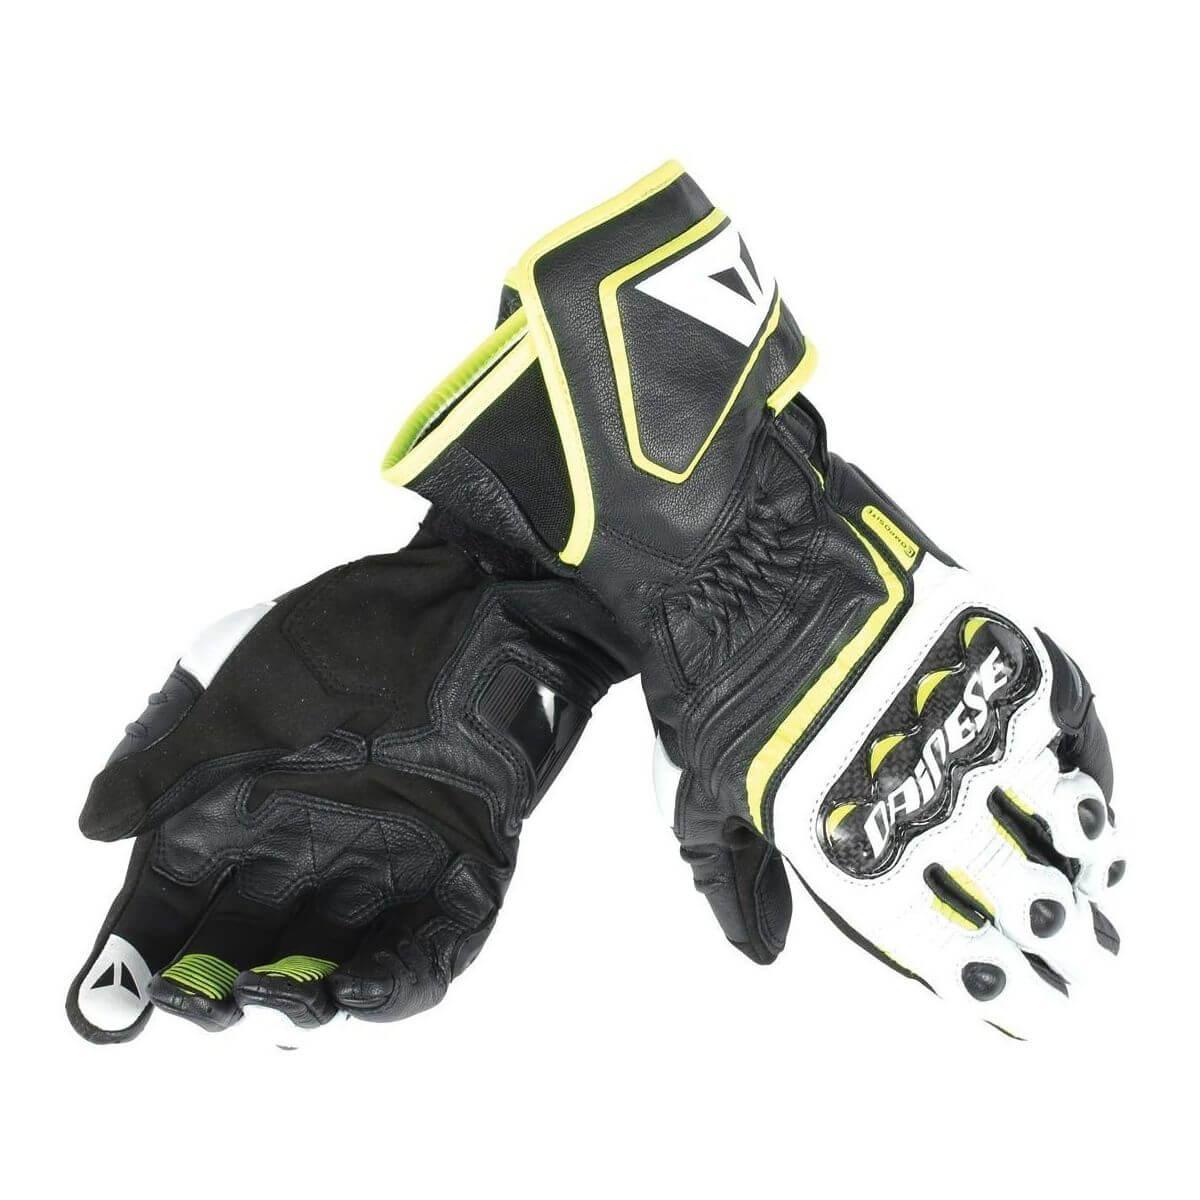 Dainese rokavice Carbon D1 Long